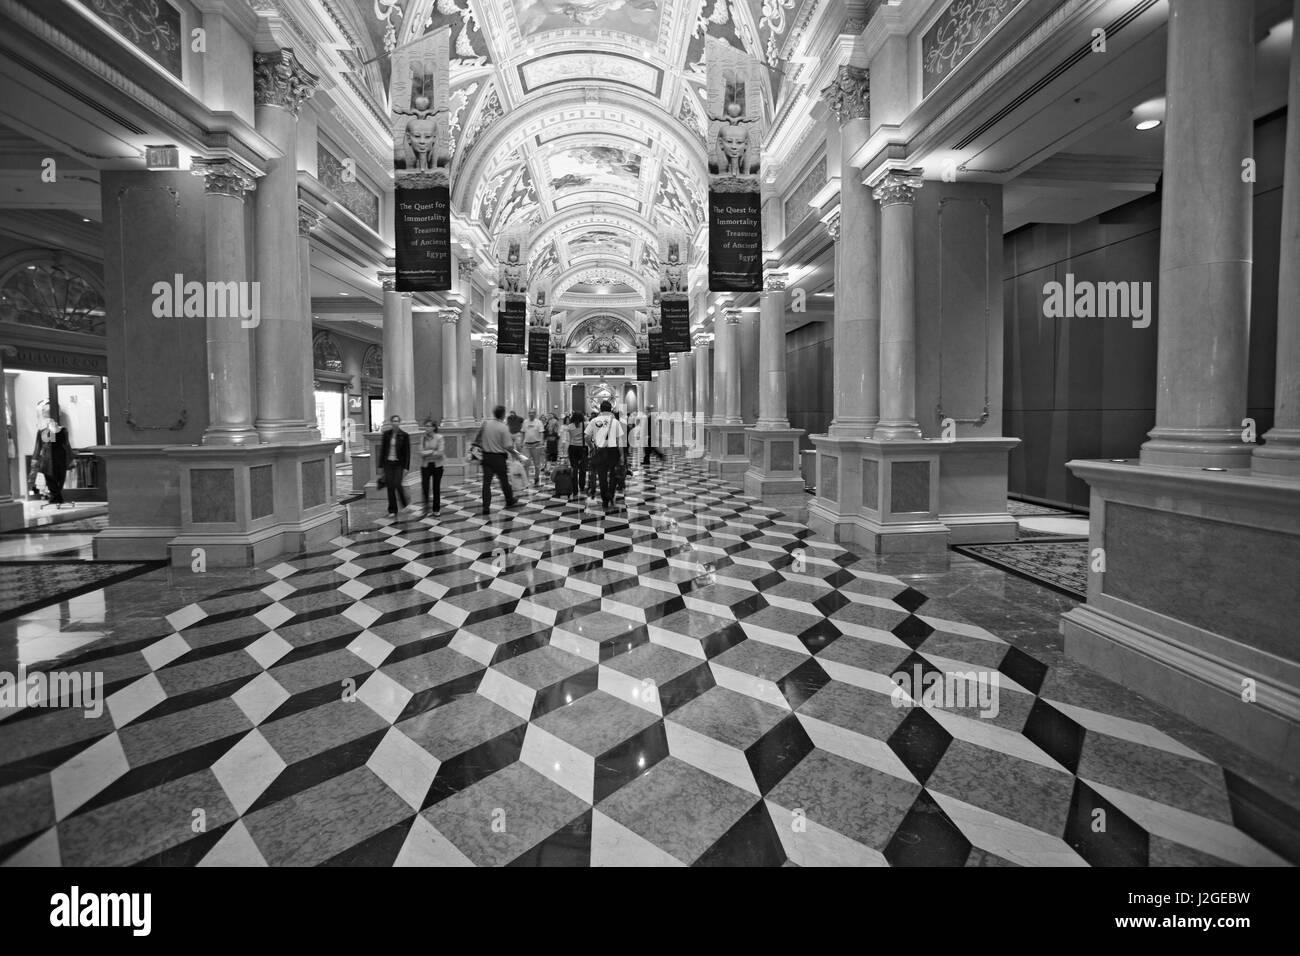 USA, Nevada, Las Vegas. Interior of Venetian Hotel. Credit as: Dennis Flaherty / Jaynes Gallery / DanitaDelimont.com - Stock Image